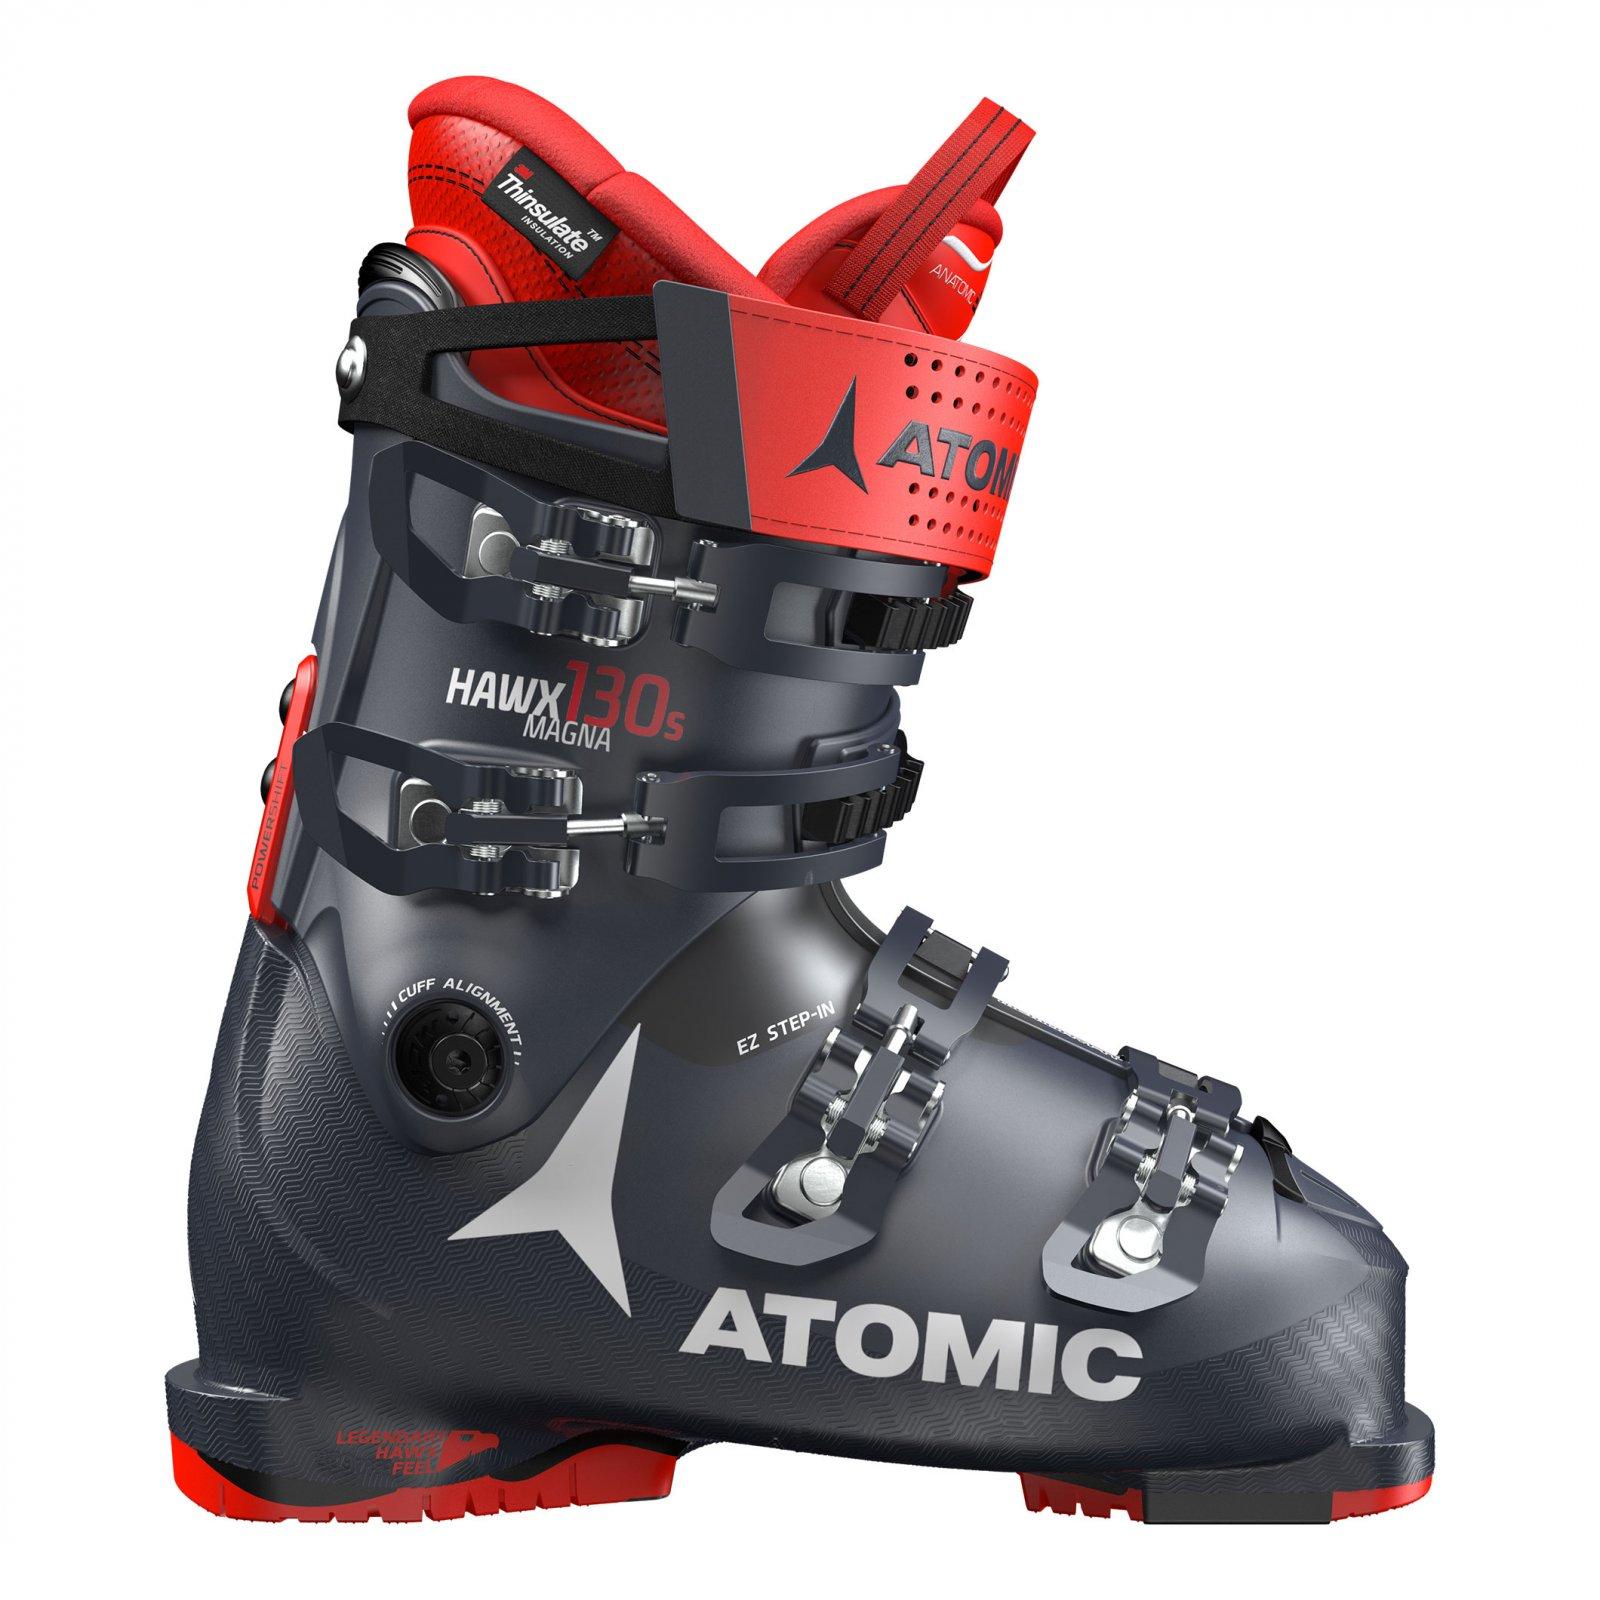 Atomic Hawx Magna 130 Ski Boots (2018-19)